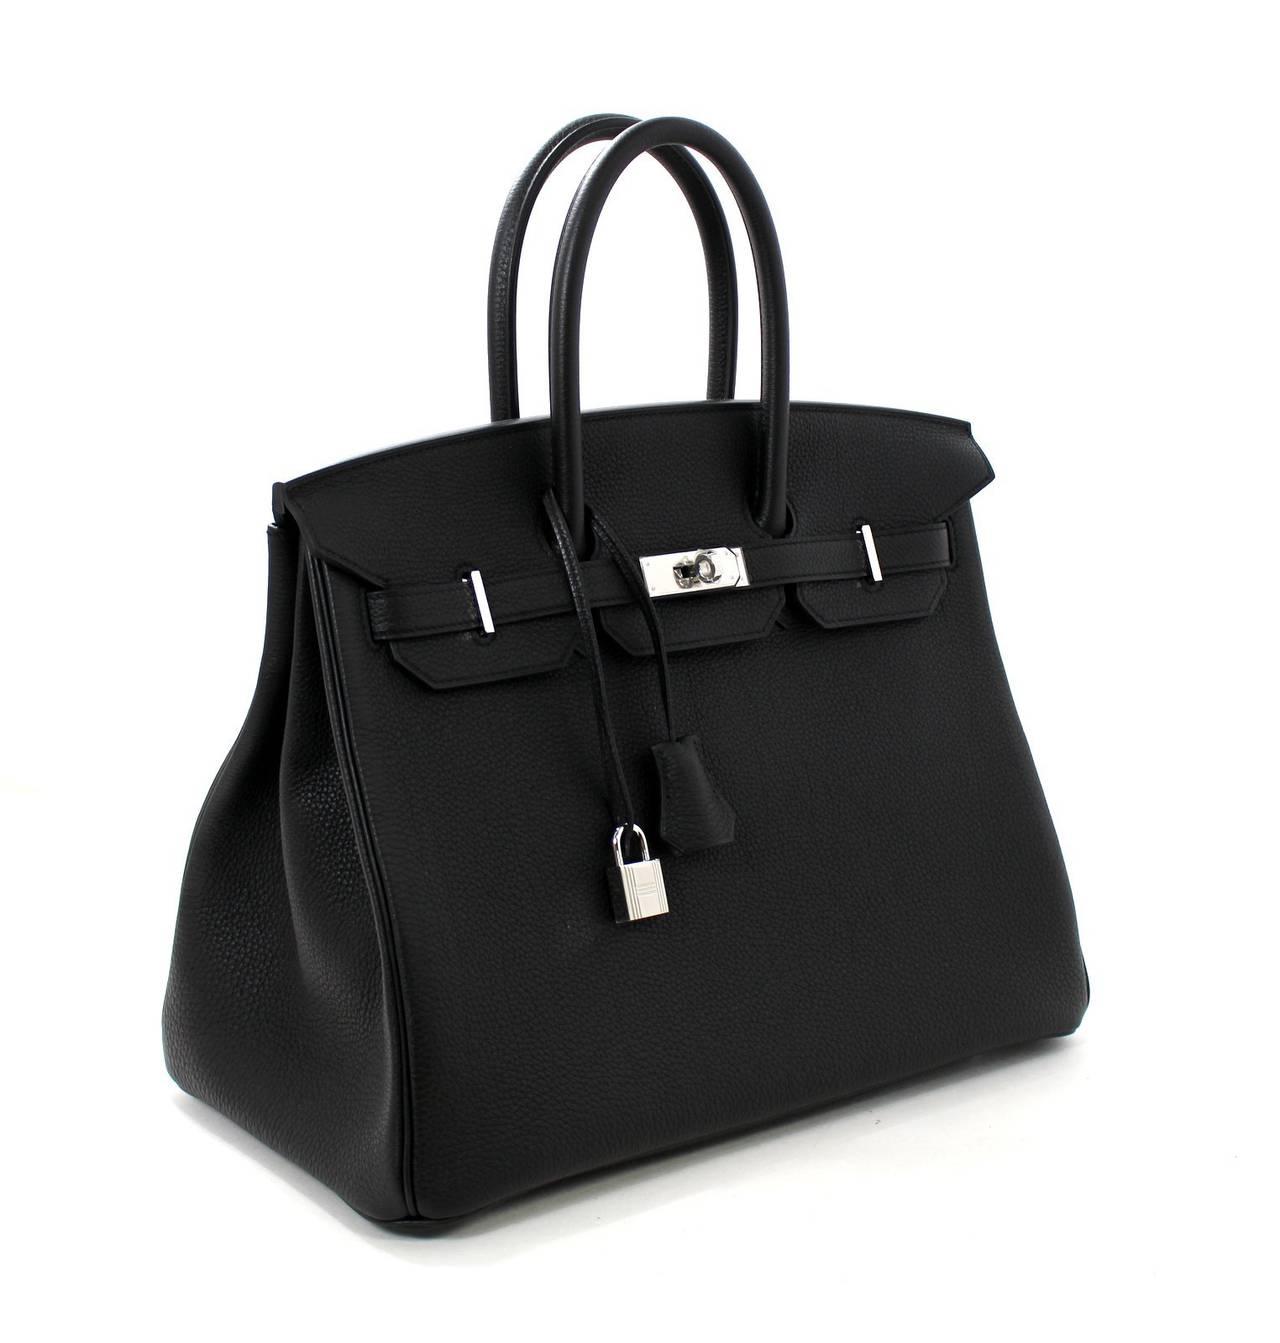 9cb4bc11a9 Hermes Birkin 35 Bag Togo Leather Red